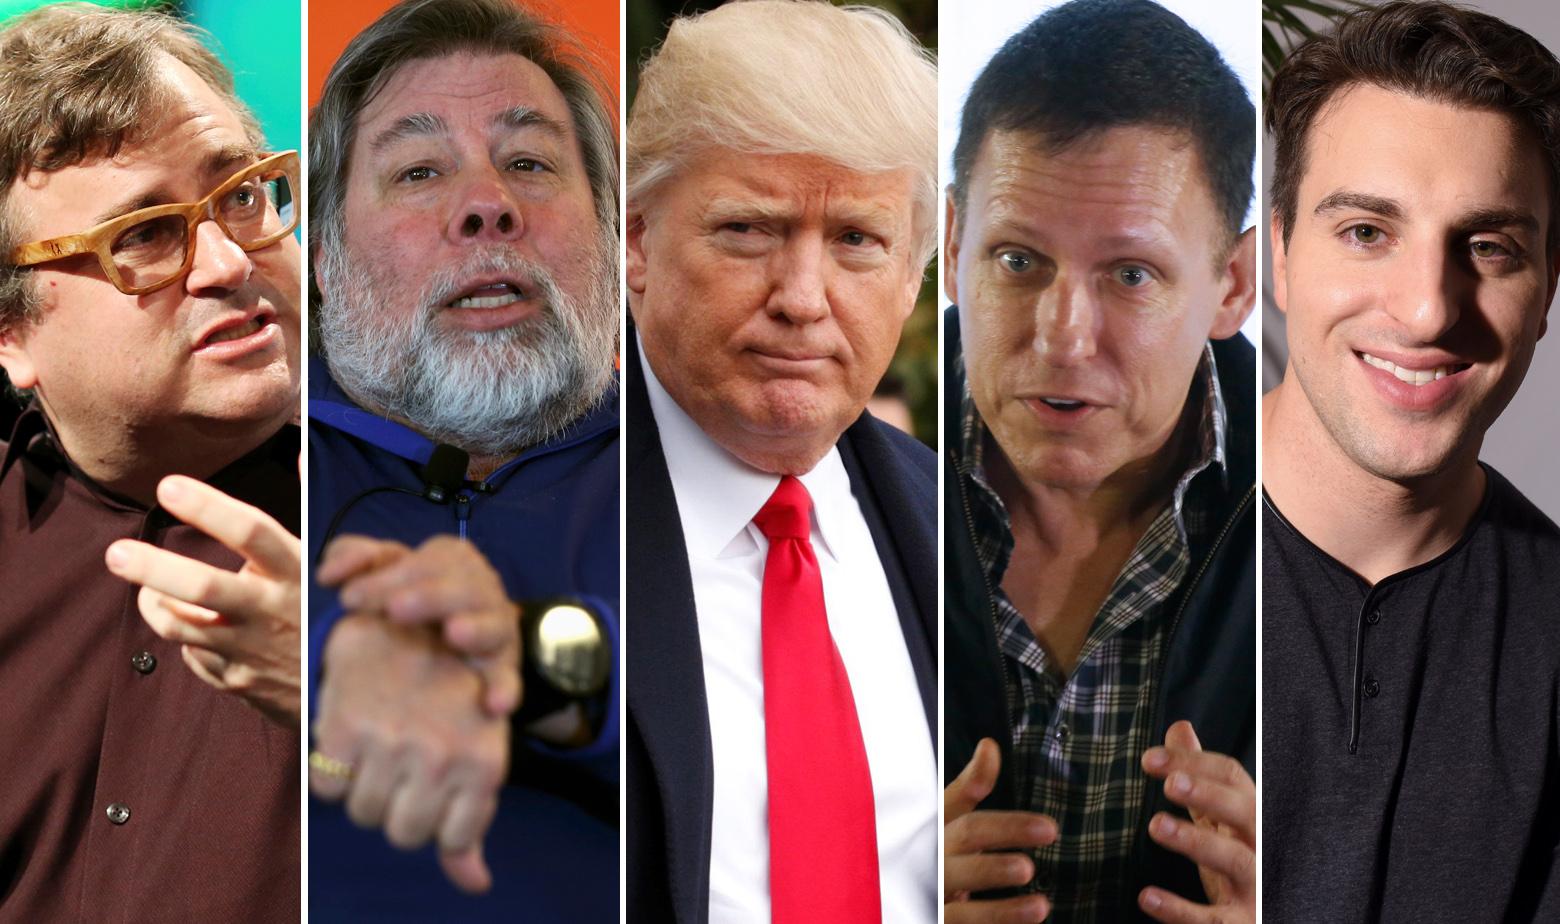 S lijeva na desno: Reid Hoffman, suosnivač LinkedIna, Steve Wozniak, suosnivač Applea, Donald Trump, Peter Thiel, suosnivač PayPala i Brian Chesky CEO Airbnb-a